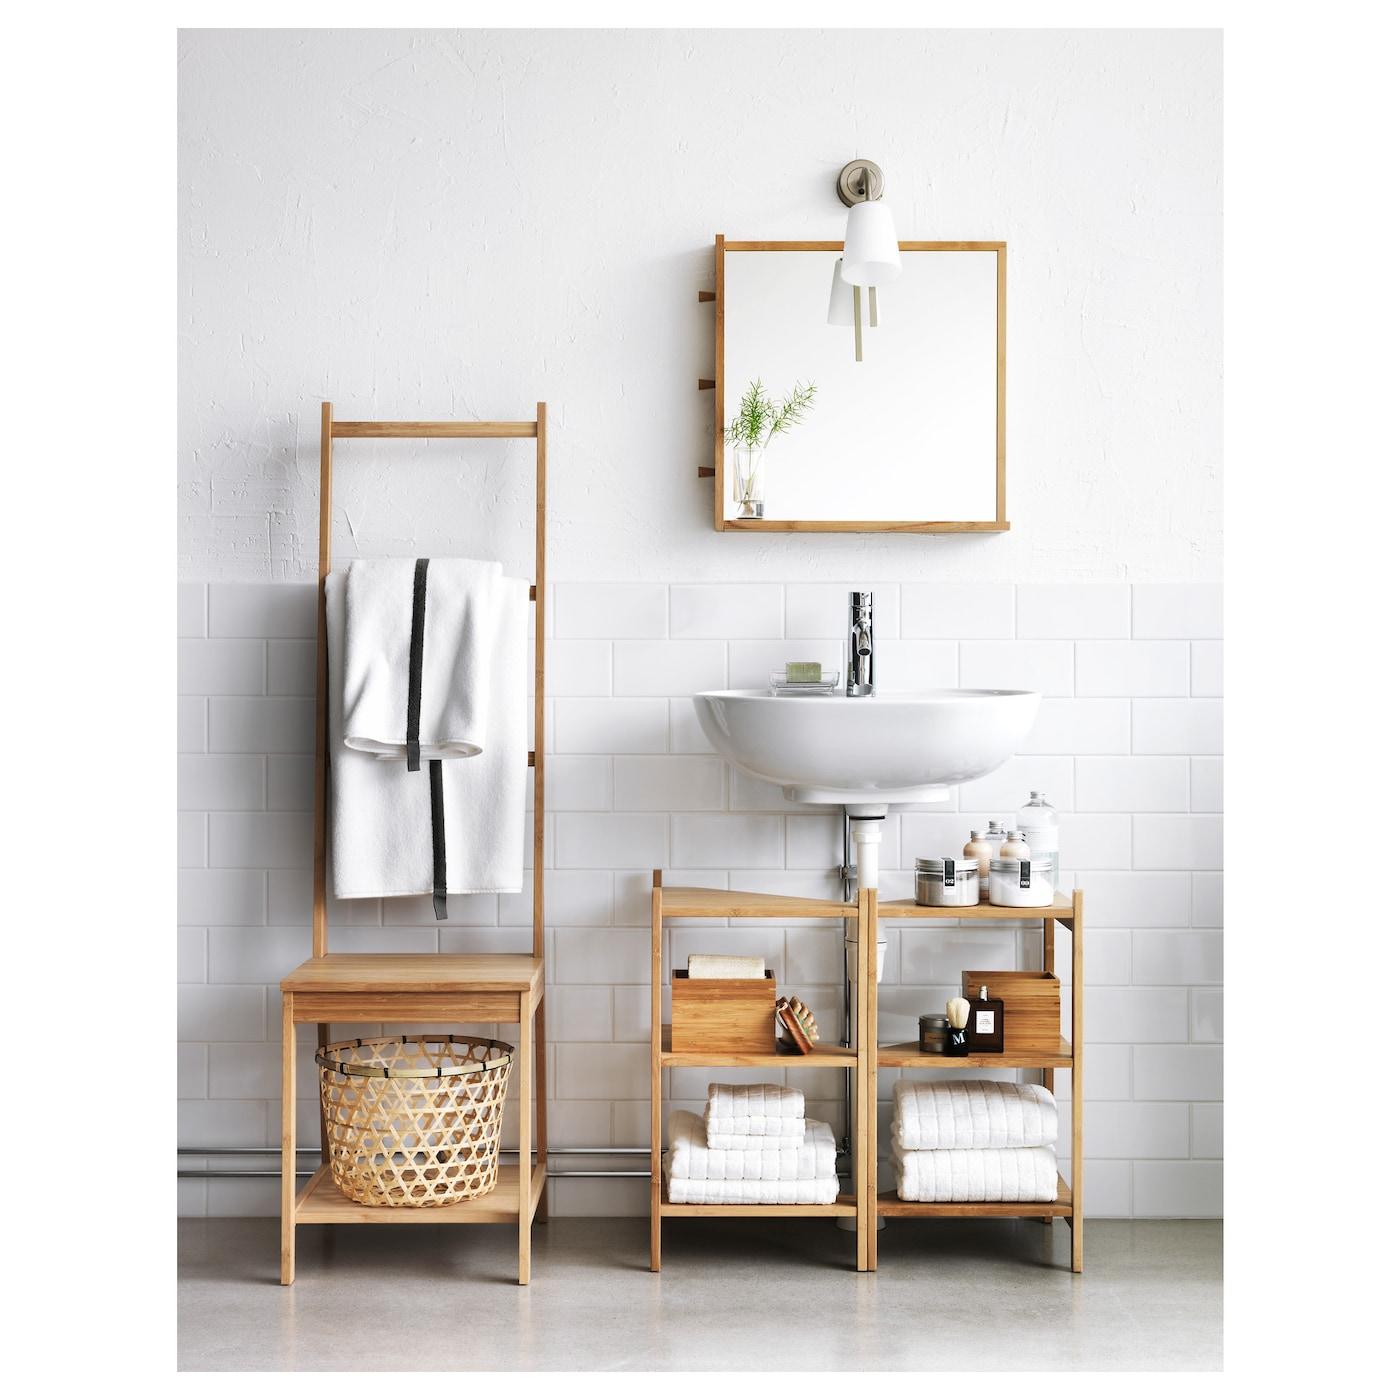 RÅGRUND Wash-basin/corner shelf - bamboo 4x4 cm